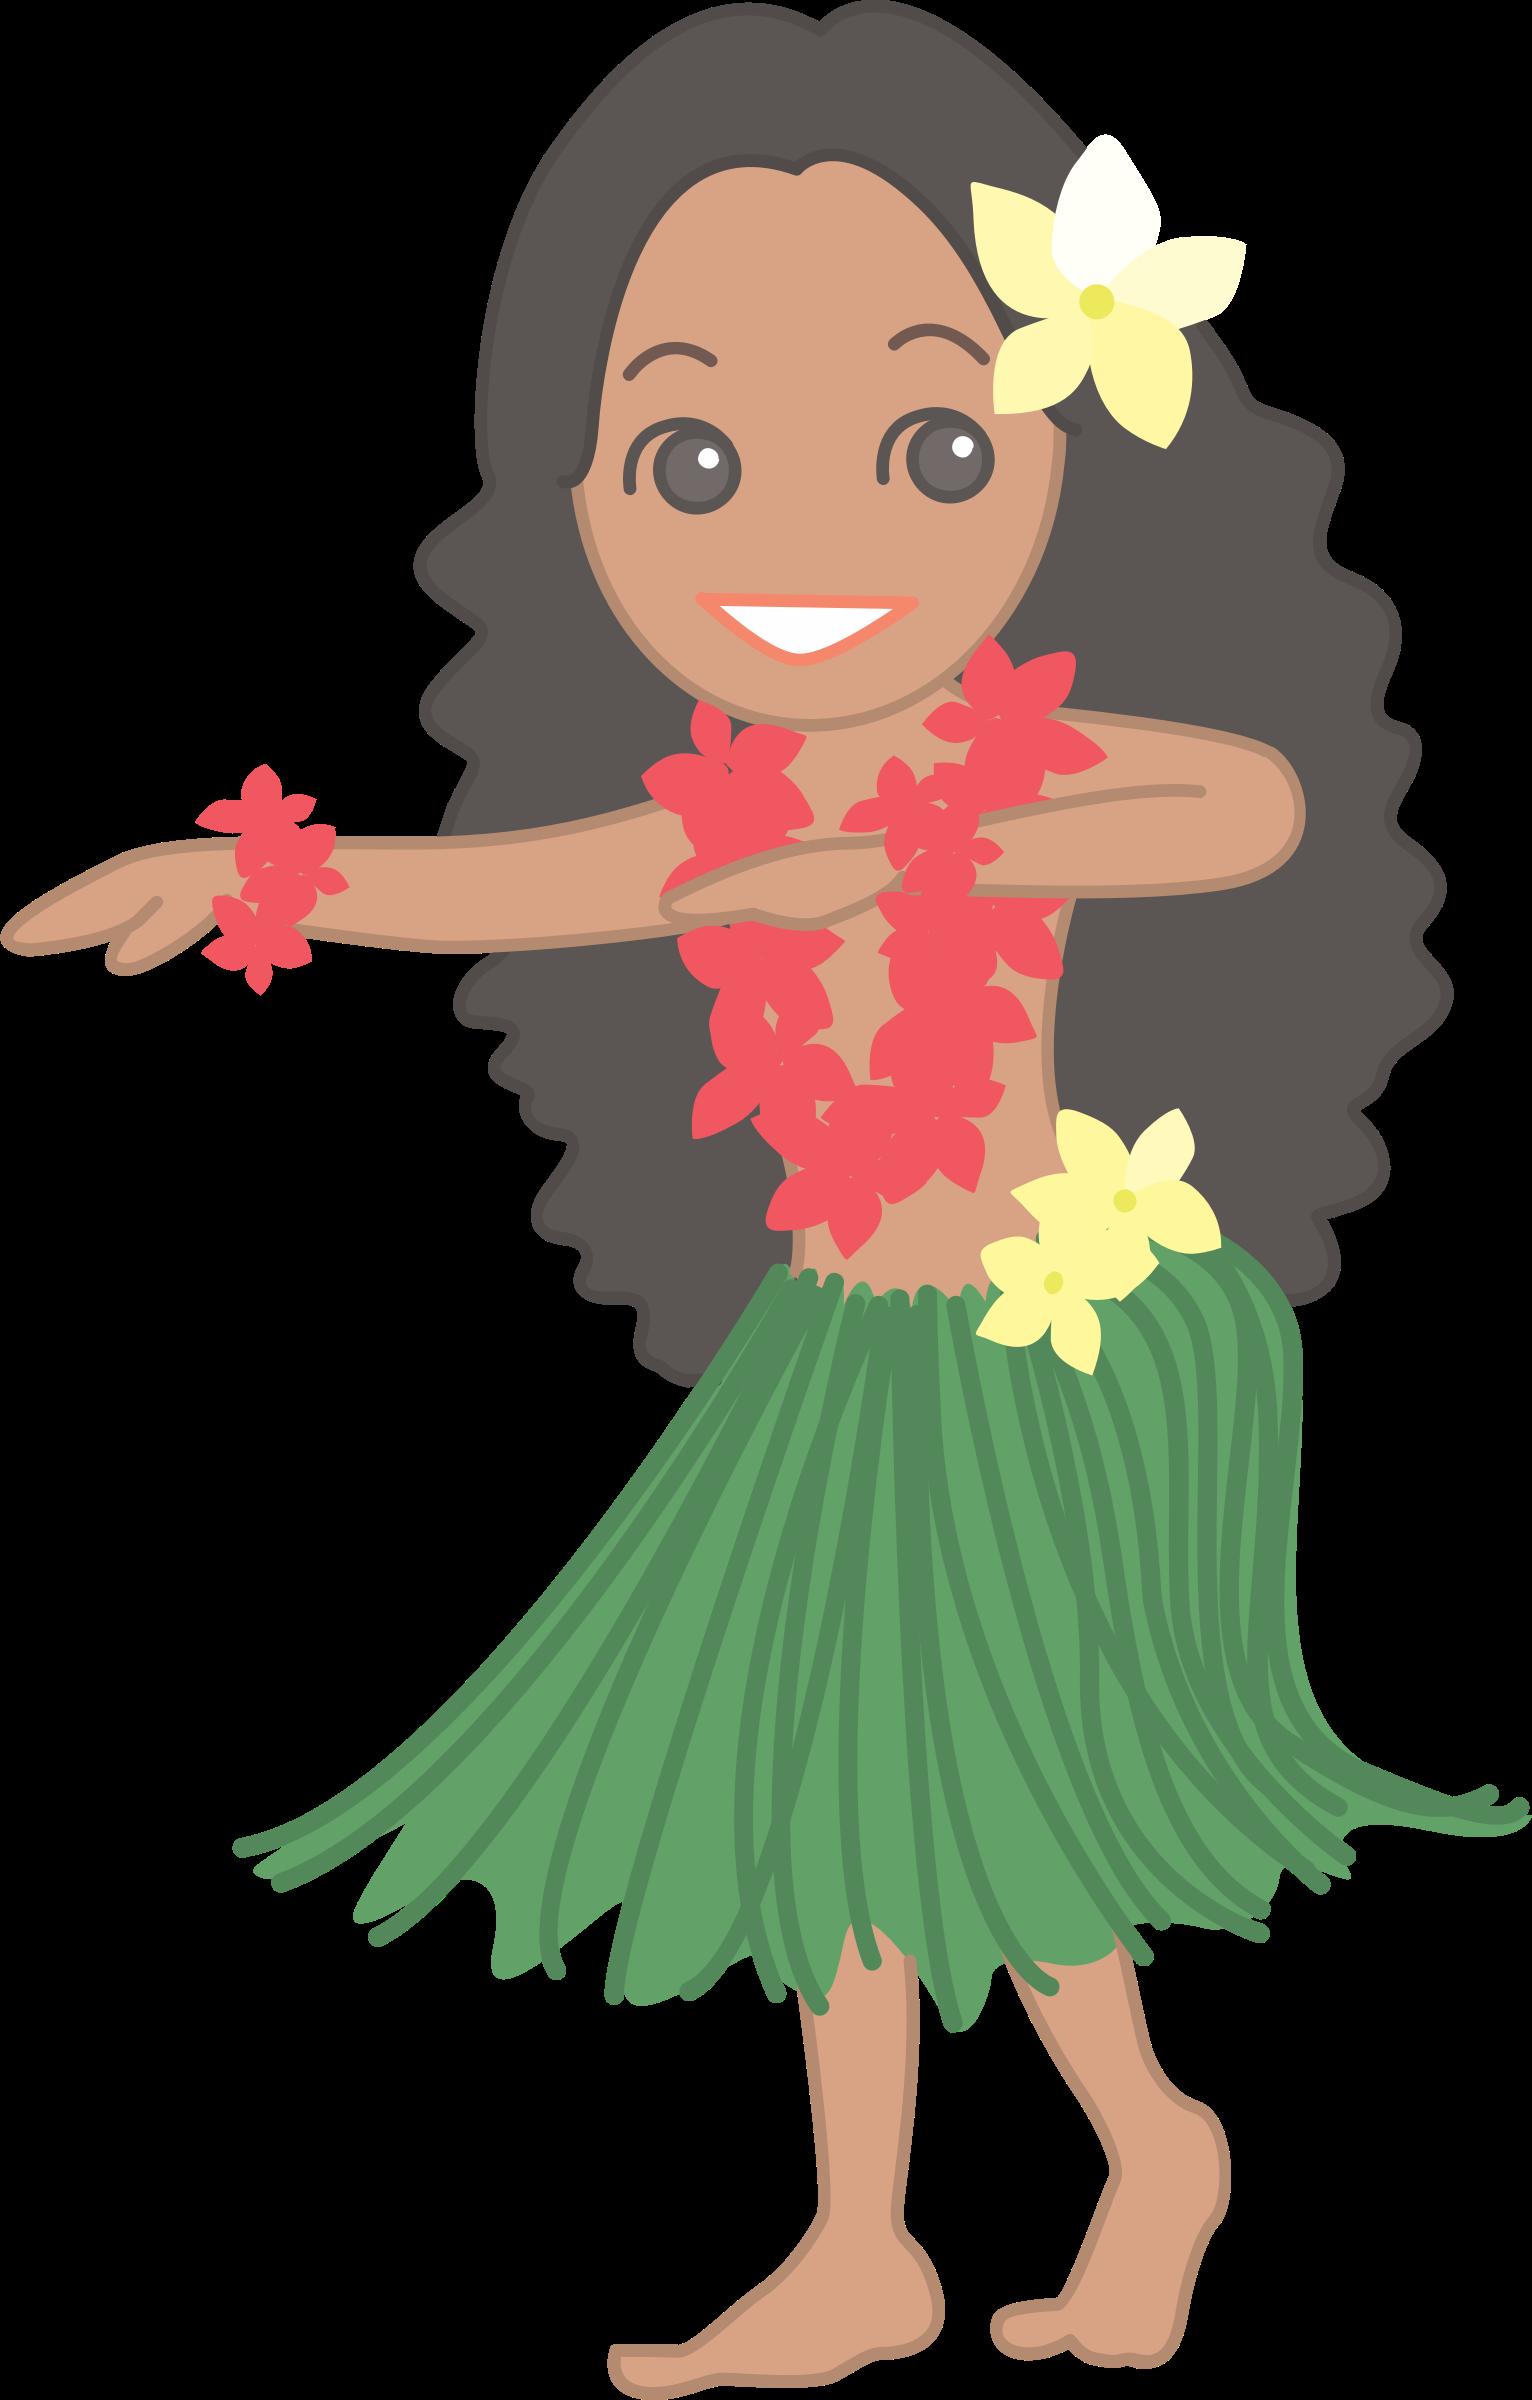 clipart hula dancer   1 Dance Silhouette Clip Art people dancing clip art images